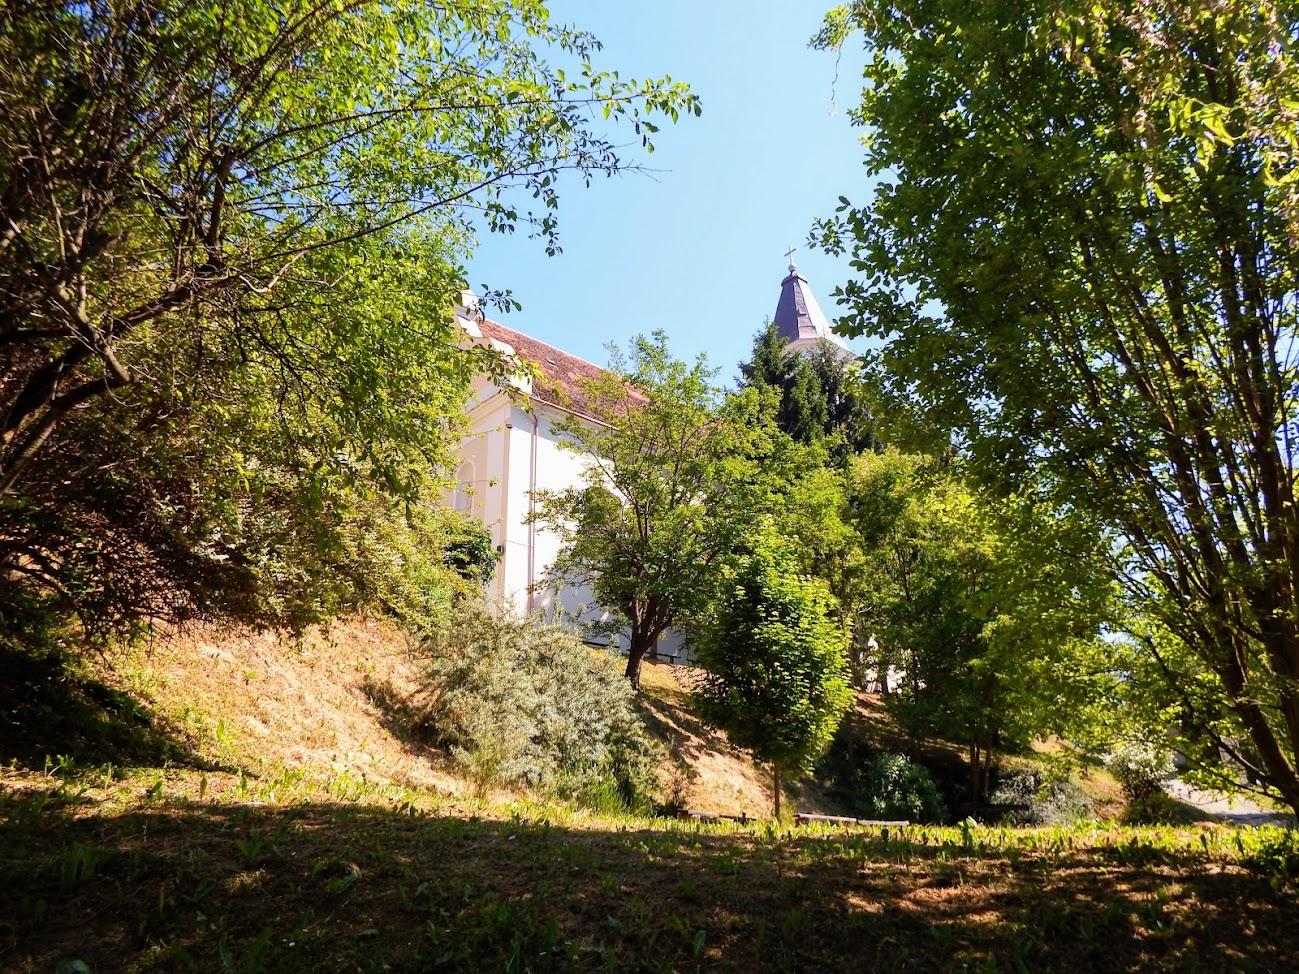 Homokkomárom - Kisboldogasszony rk. templom